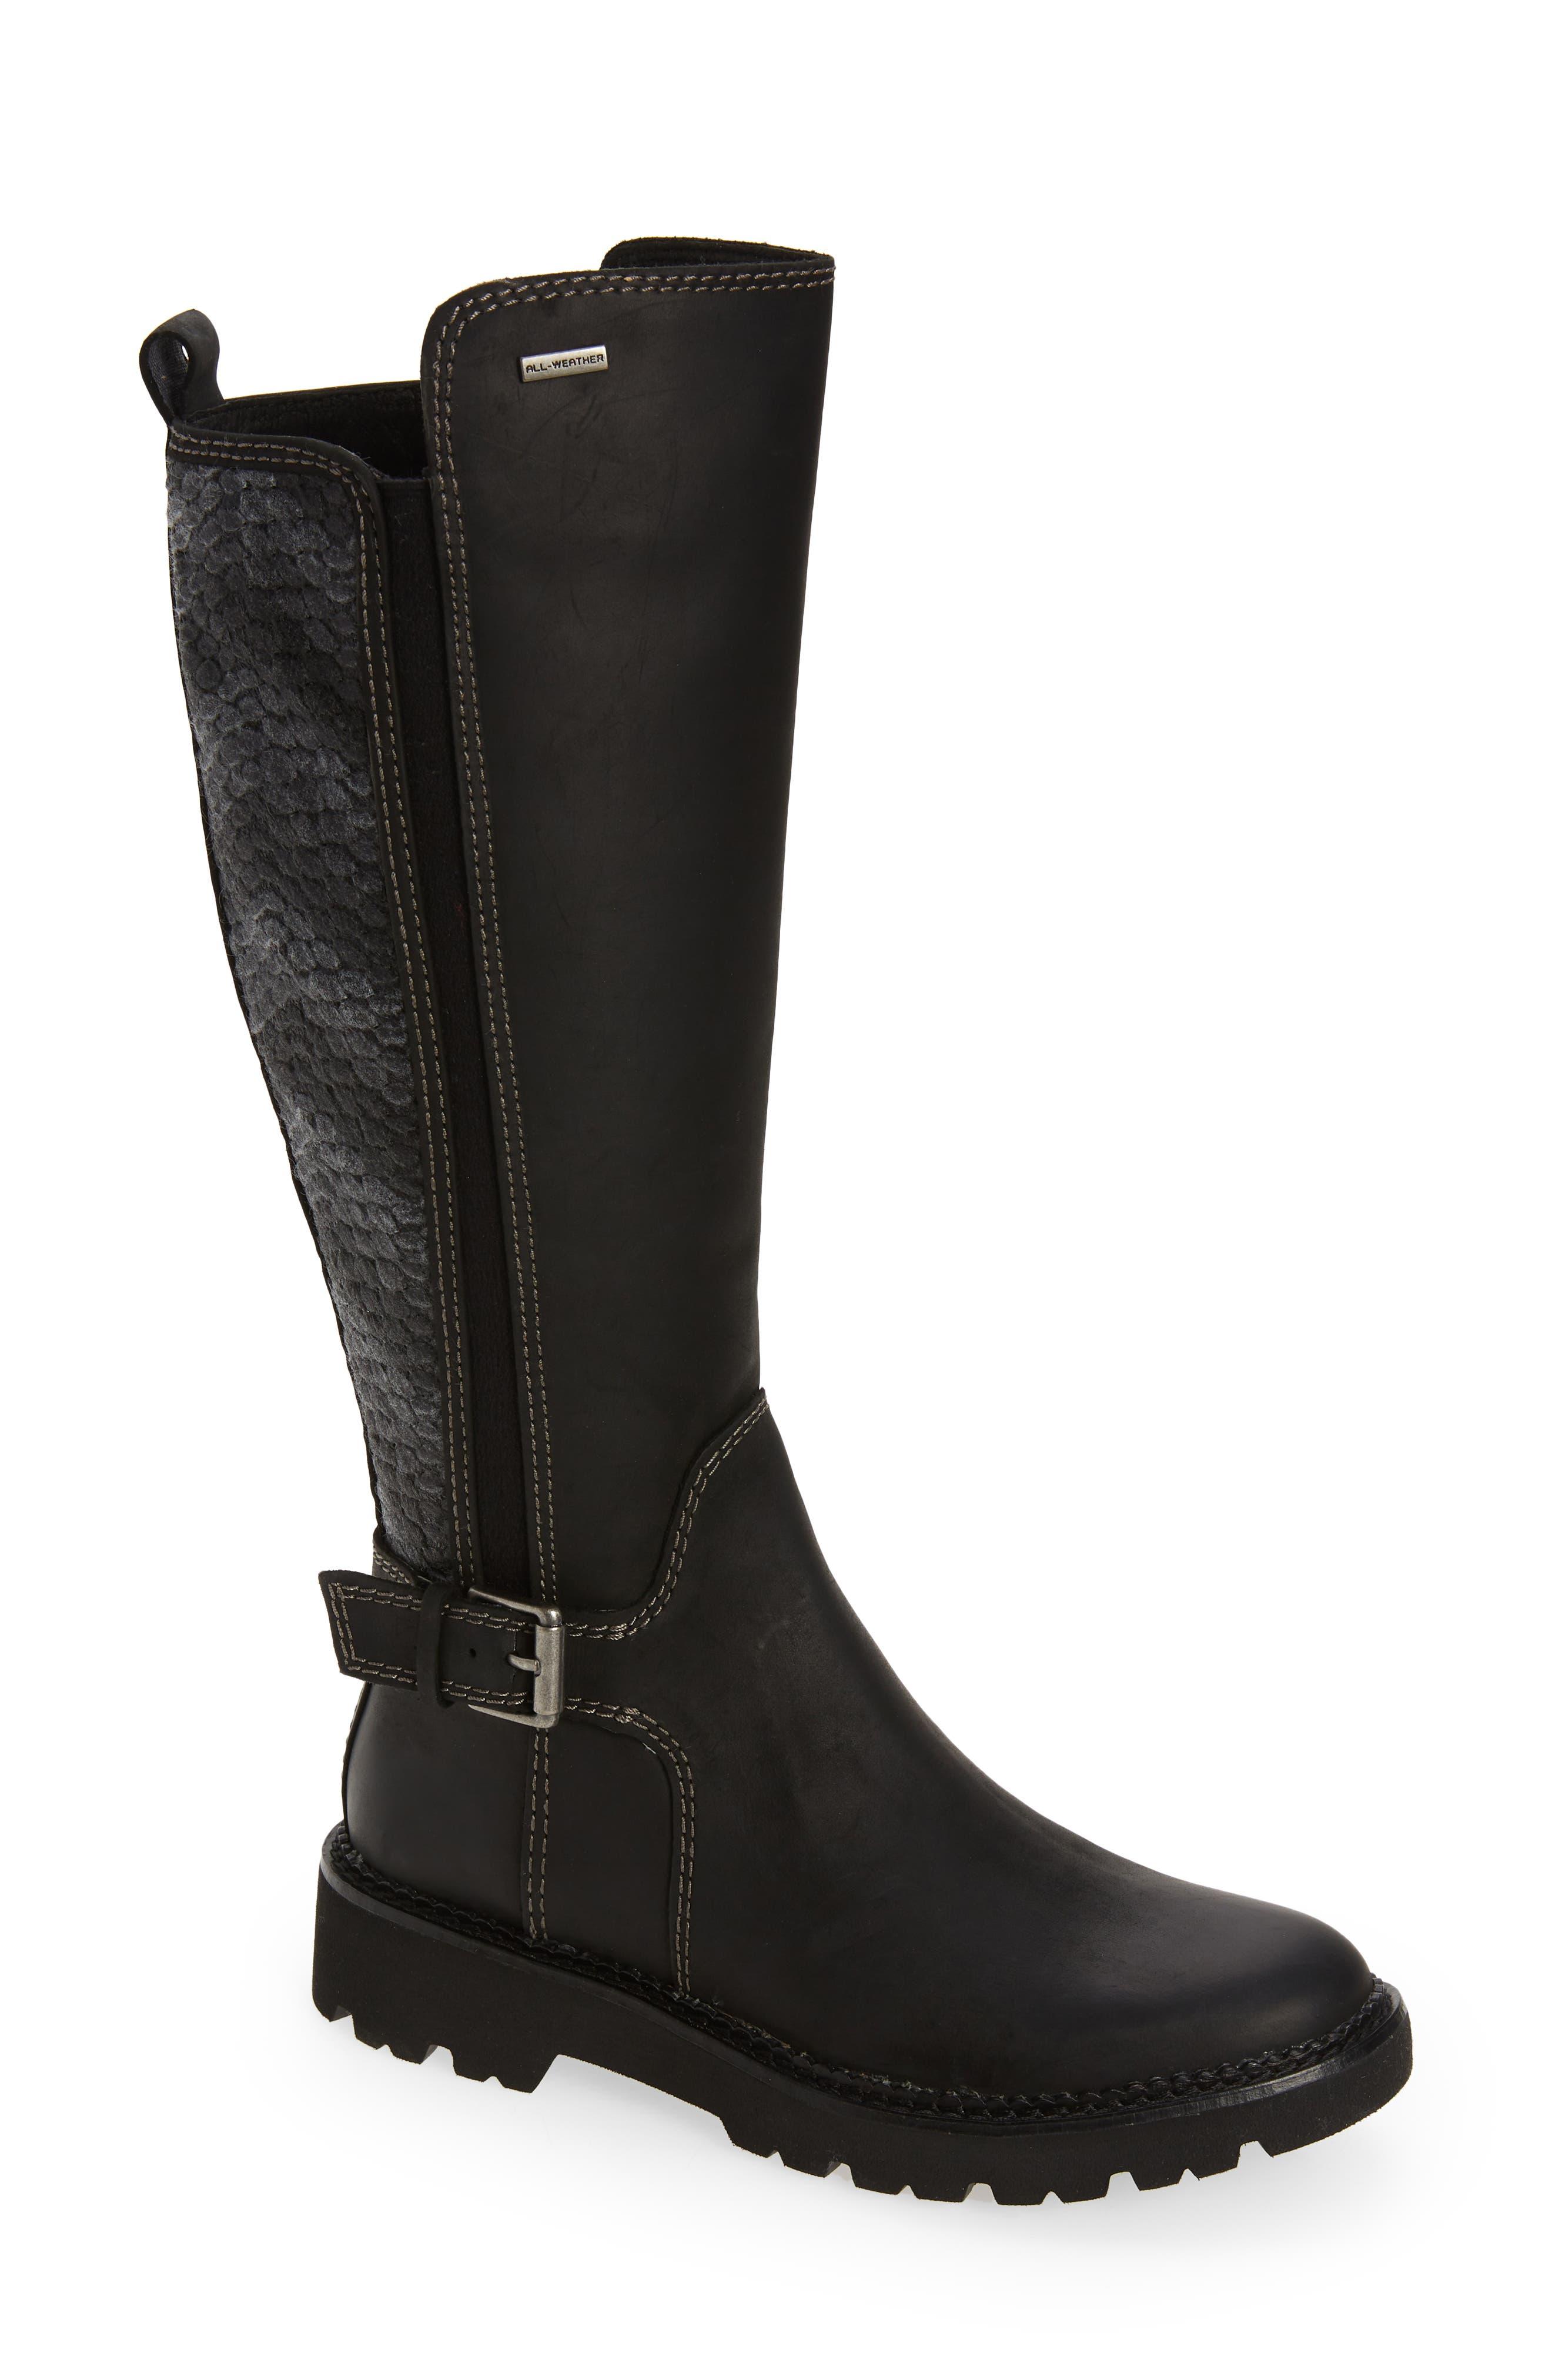 Dawkins Waterproof Tall Boot